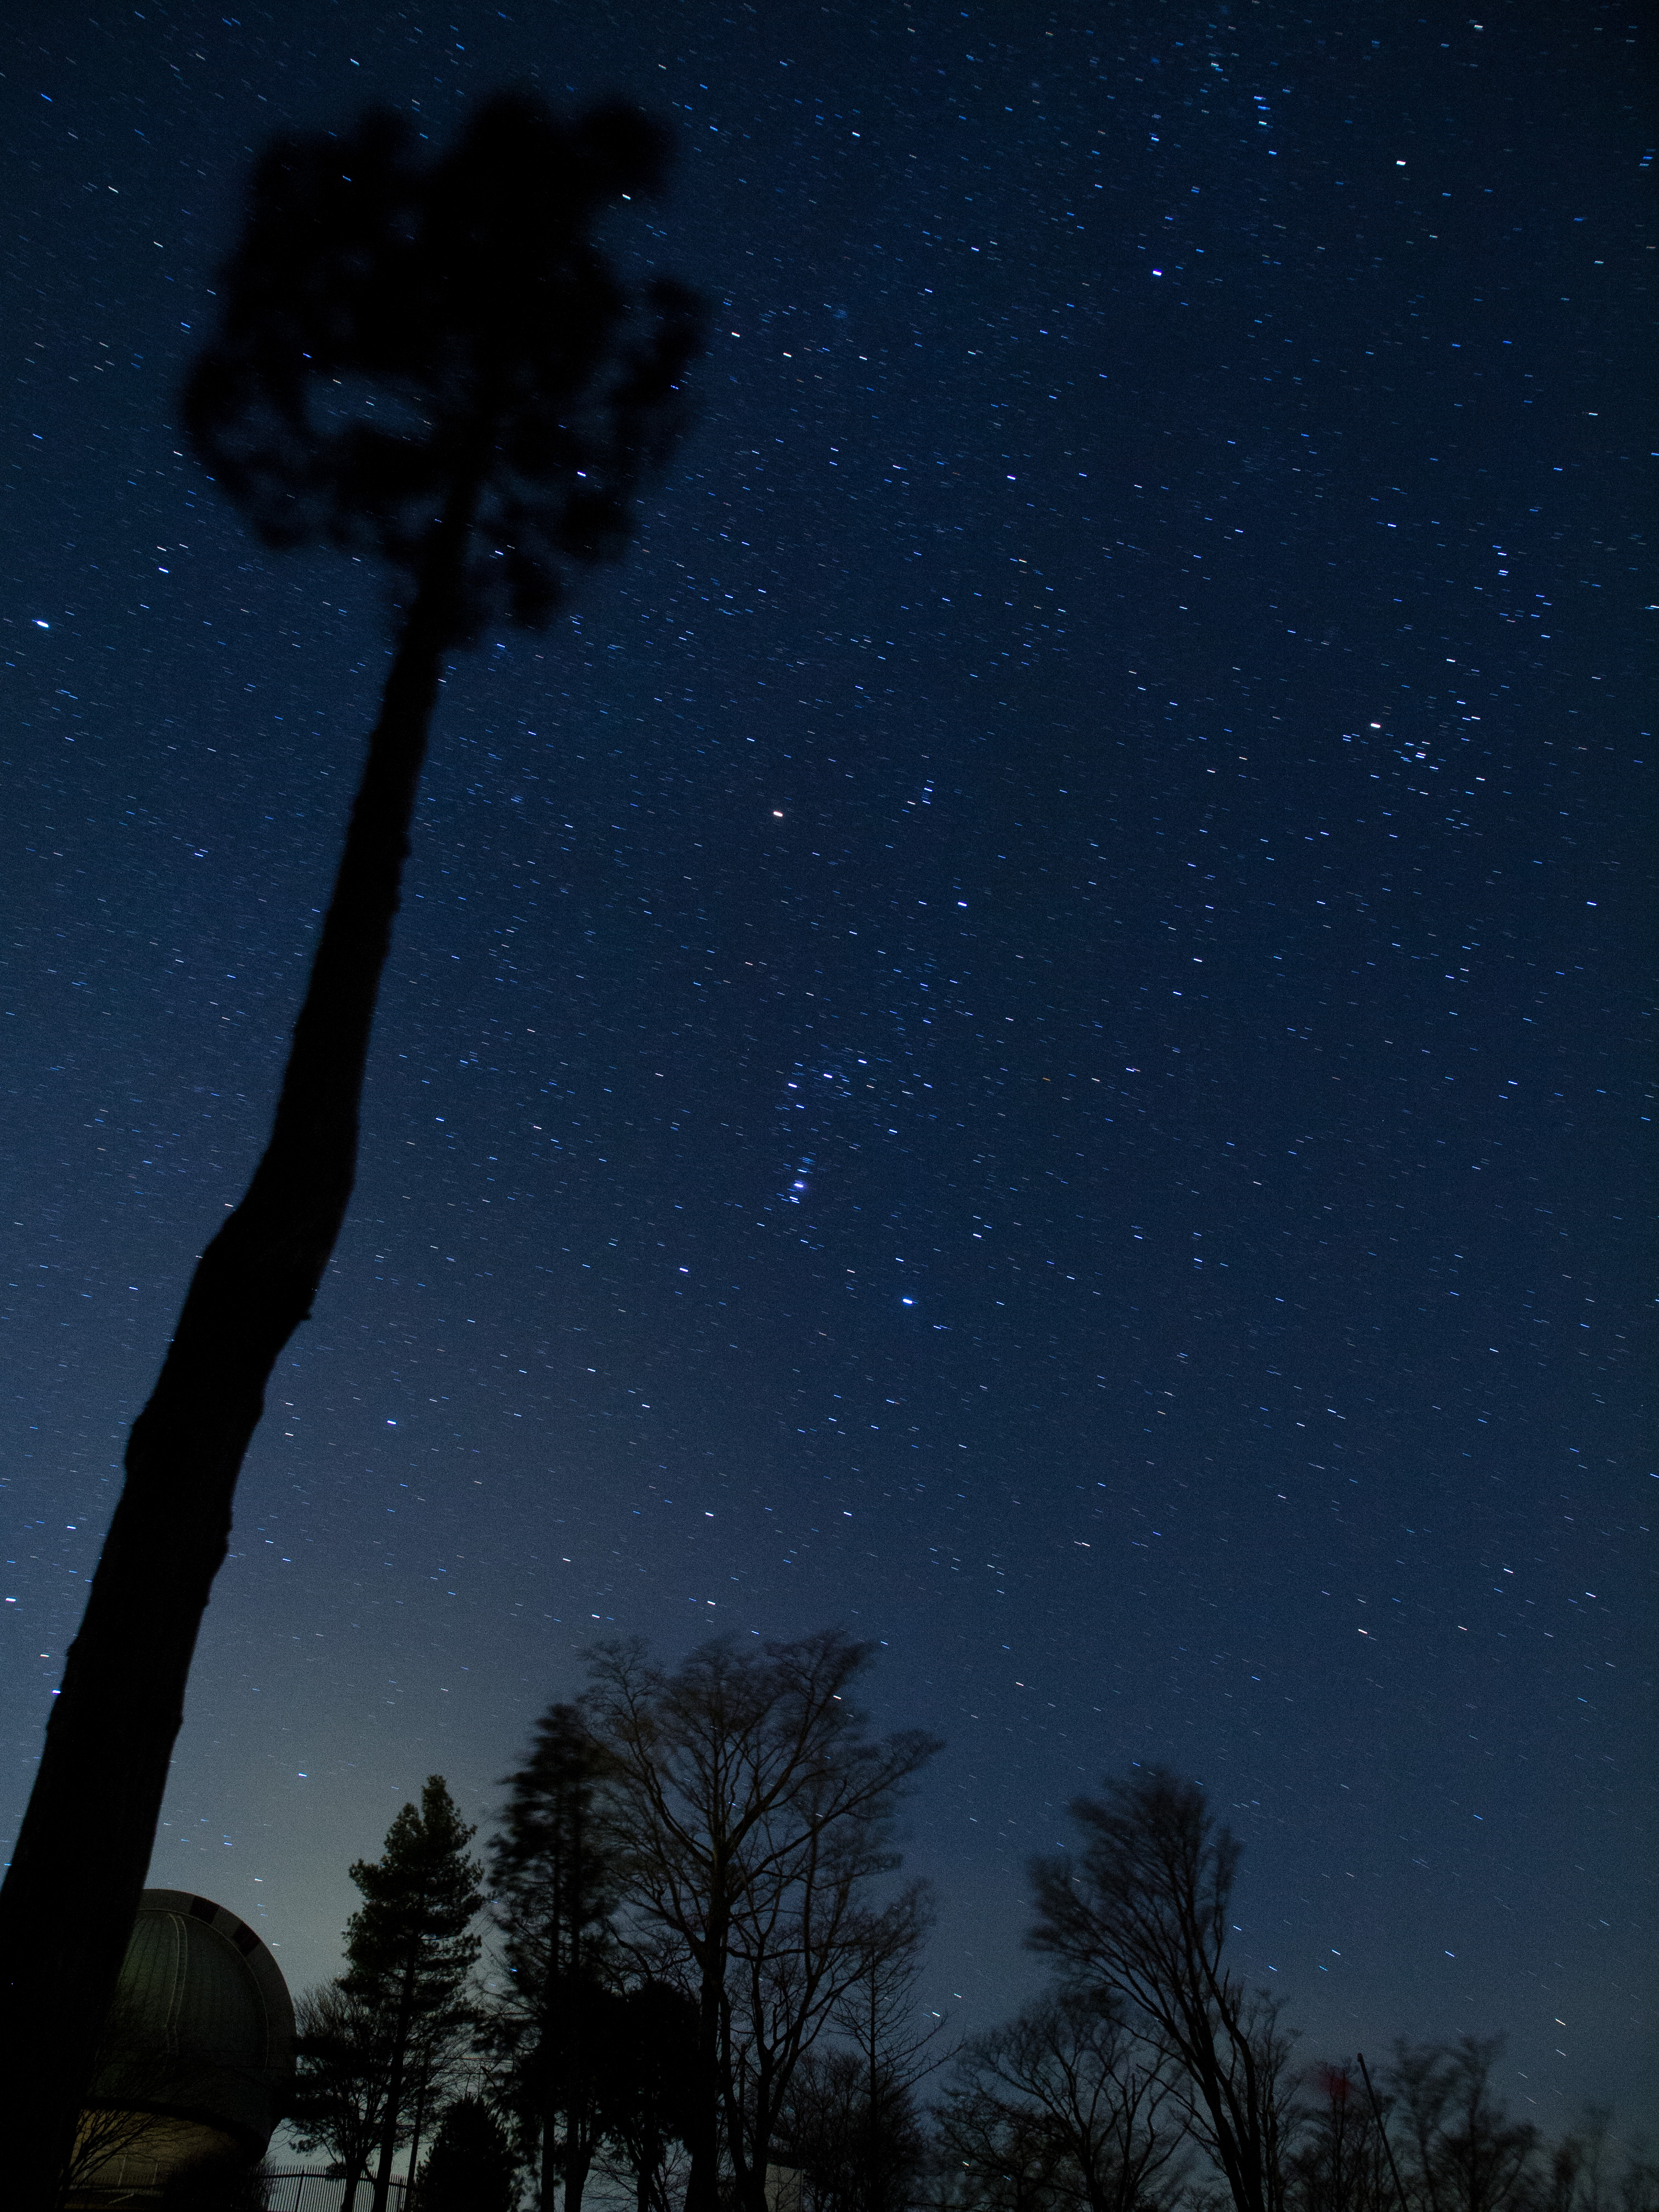 <b>カメラを三脚に固定して1分露光。地上の景色は止まっているが、星は動いてしまい流れている。E-5 / ZUIKO DIGITAL ED 12-60mm F2.8-4 SWD / 約3.8MB / 3,024×4,032 / 60秒 / F3.5 / 0EV / ISO800 / 12mm</b>